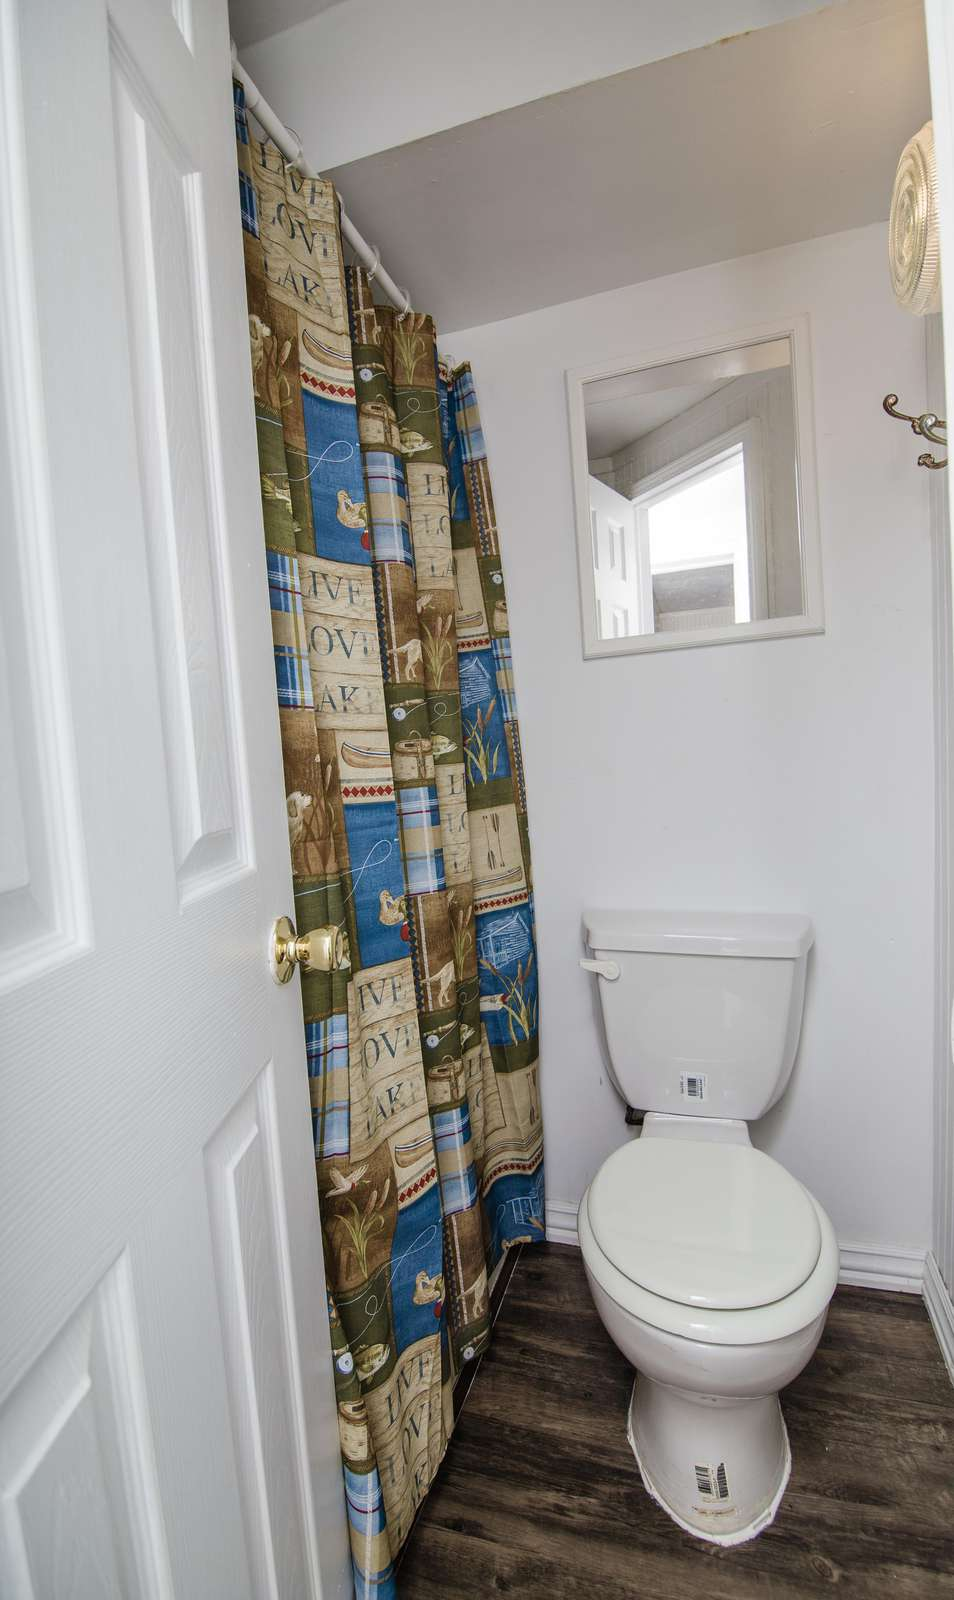 Cabin One bathroom